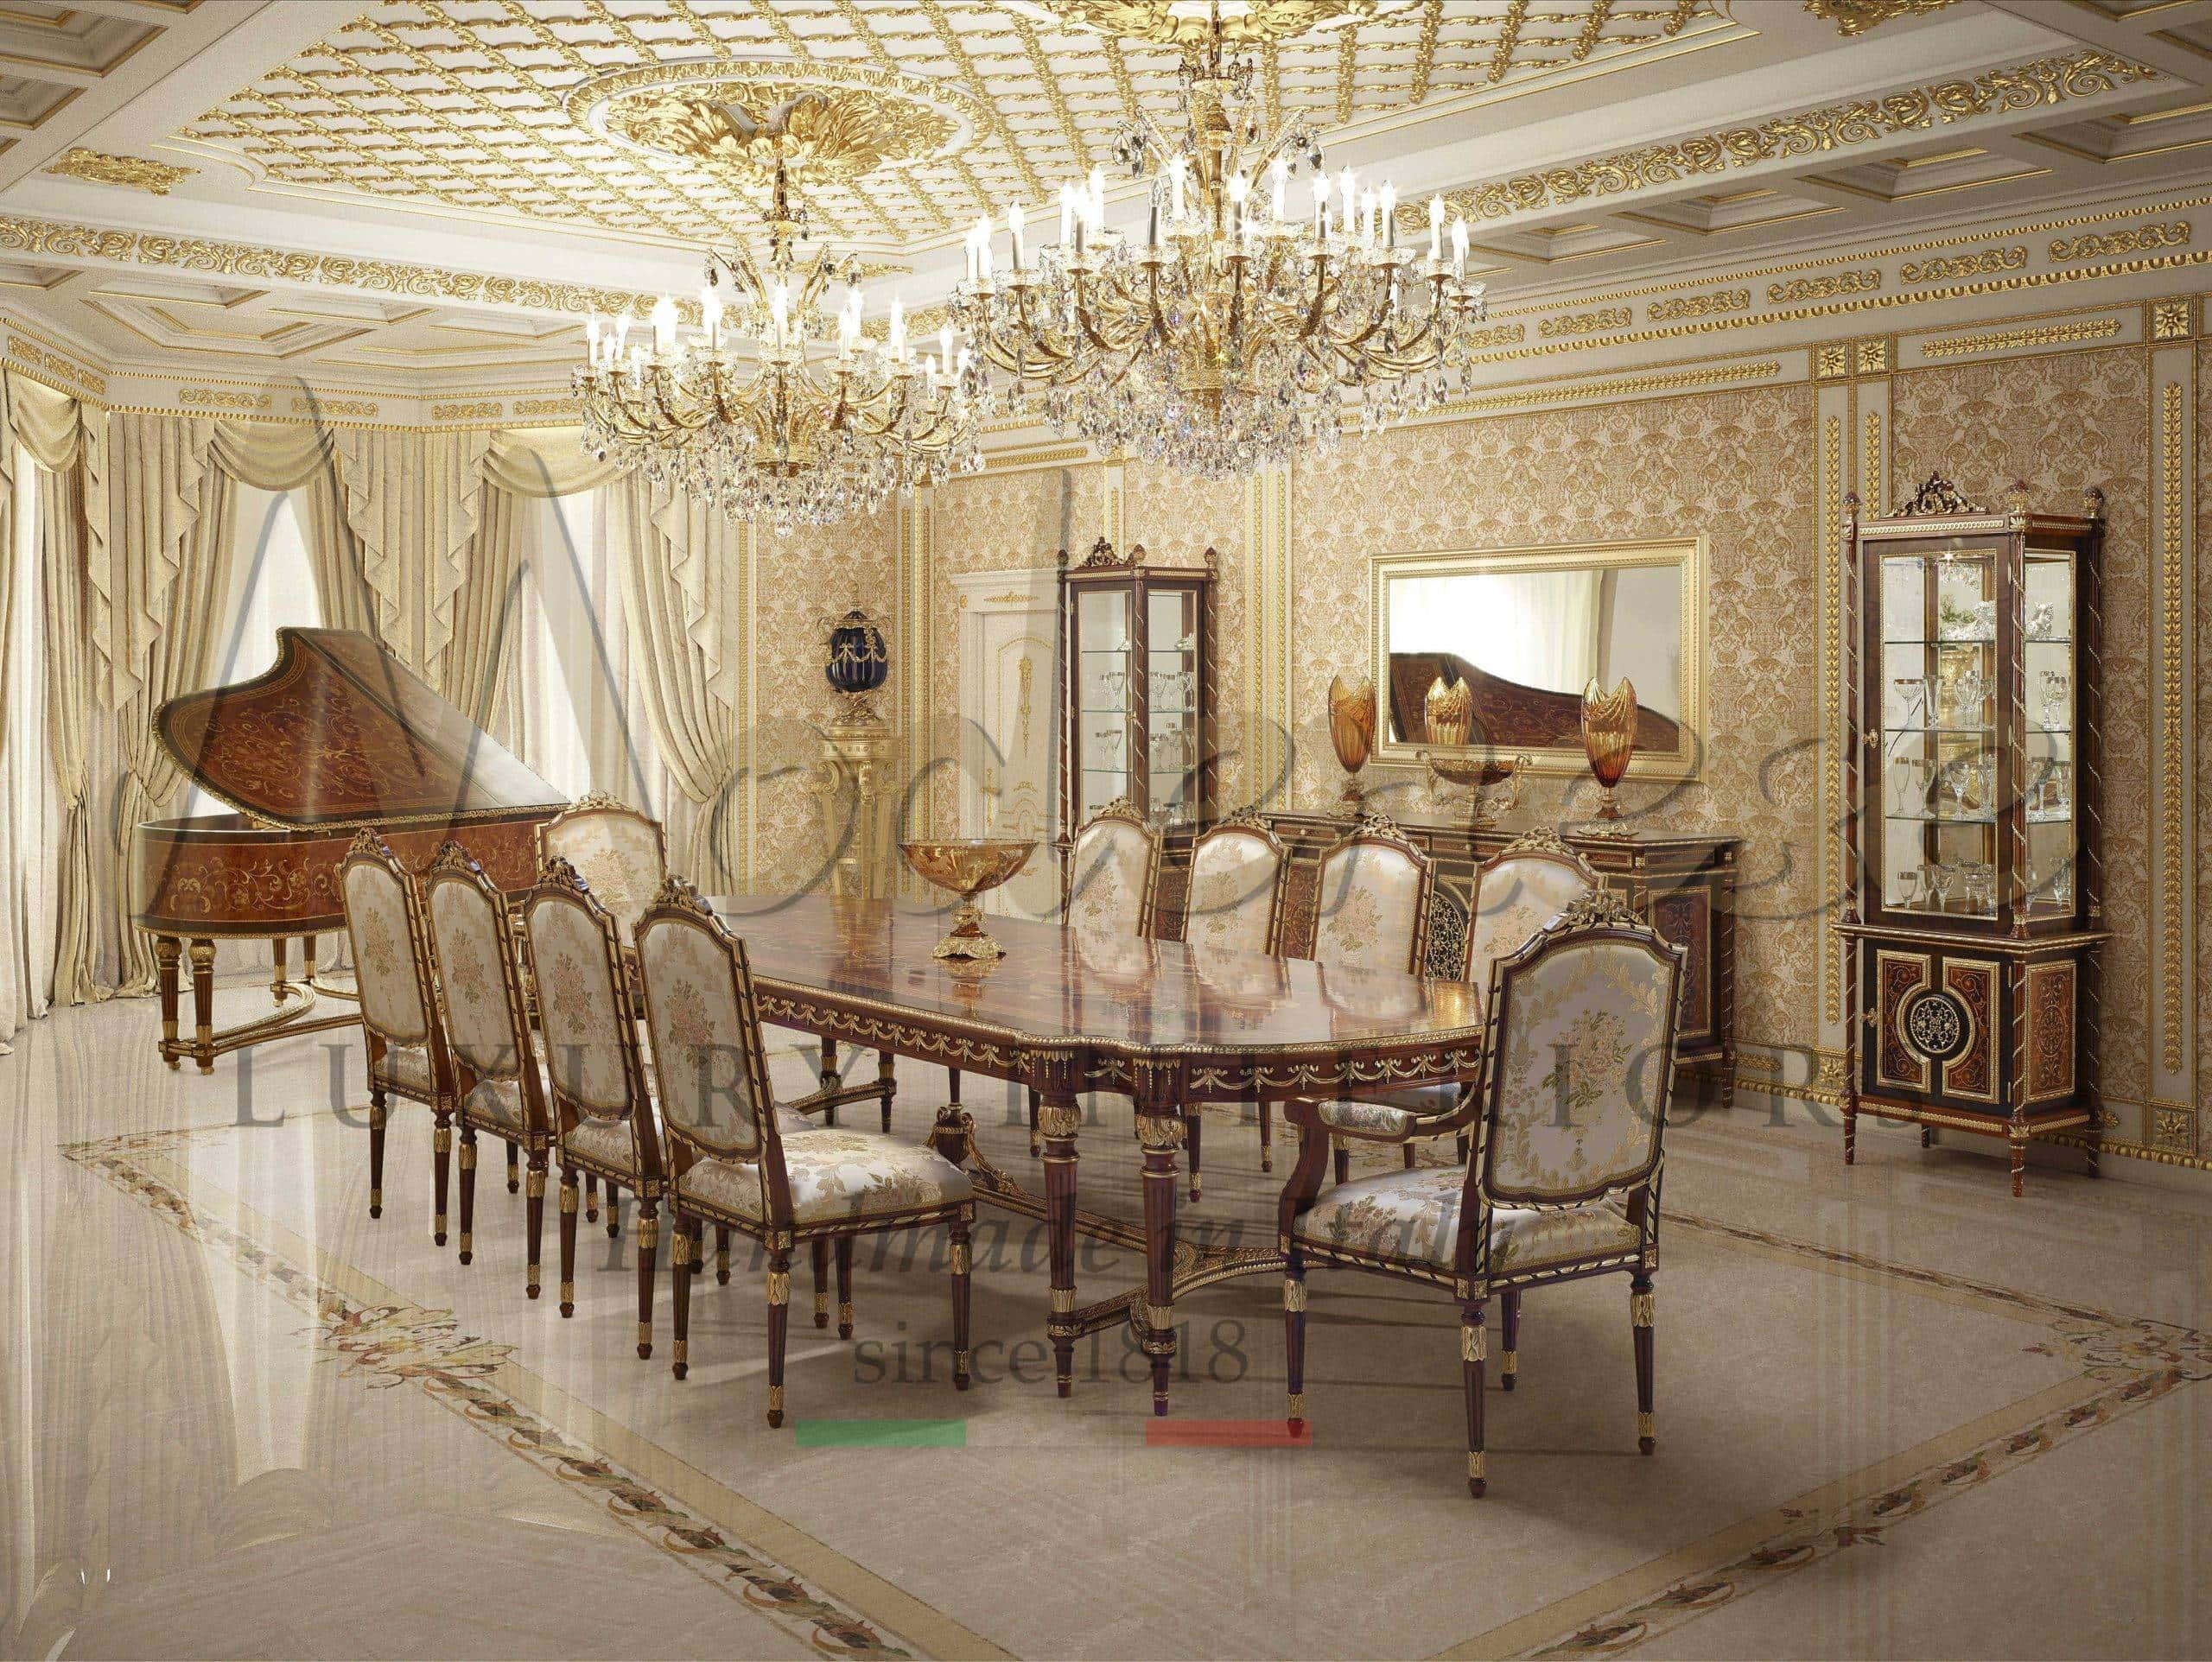 Classic Italian Luxury Dining Room Furniture Traditional Luxury Home Decor Furnishings Custom Made Top Quality Furniture Modenese